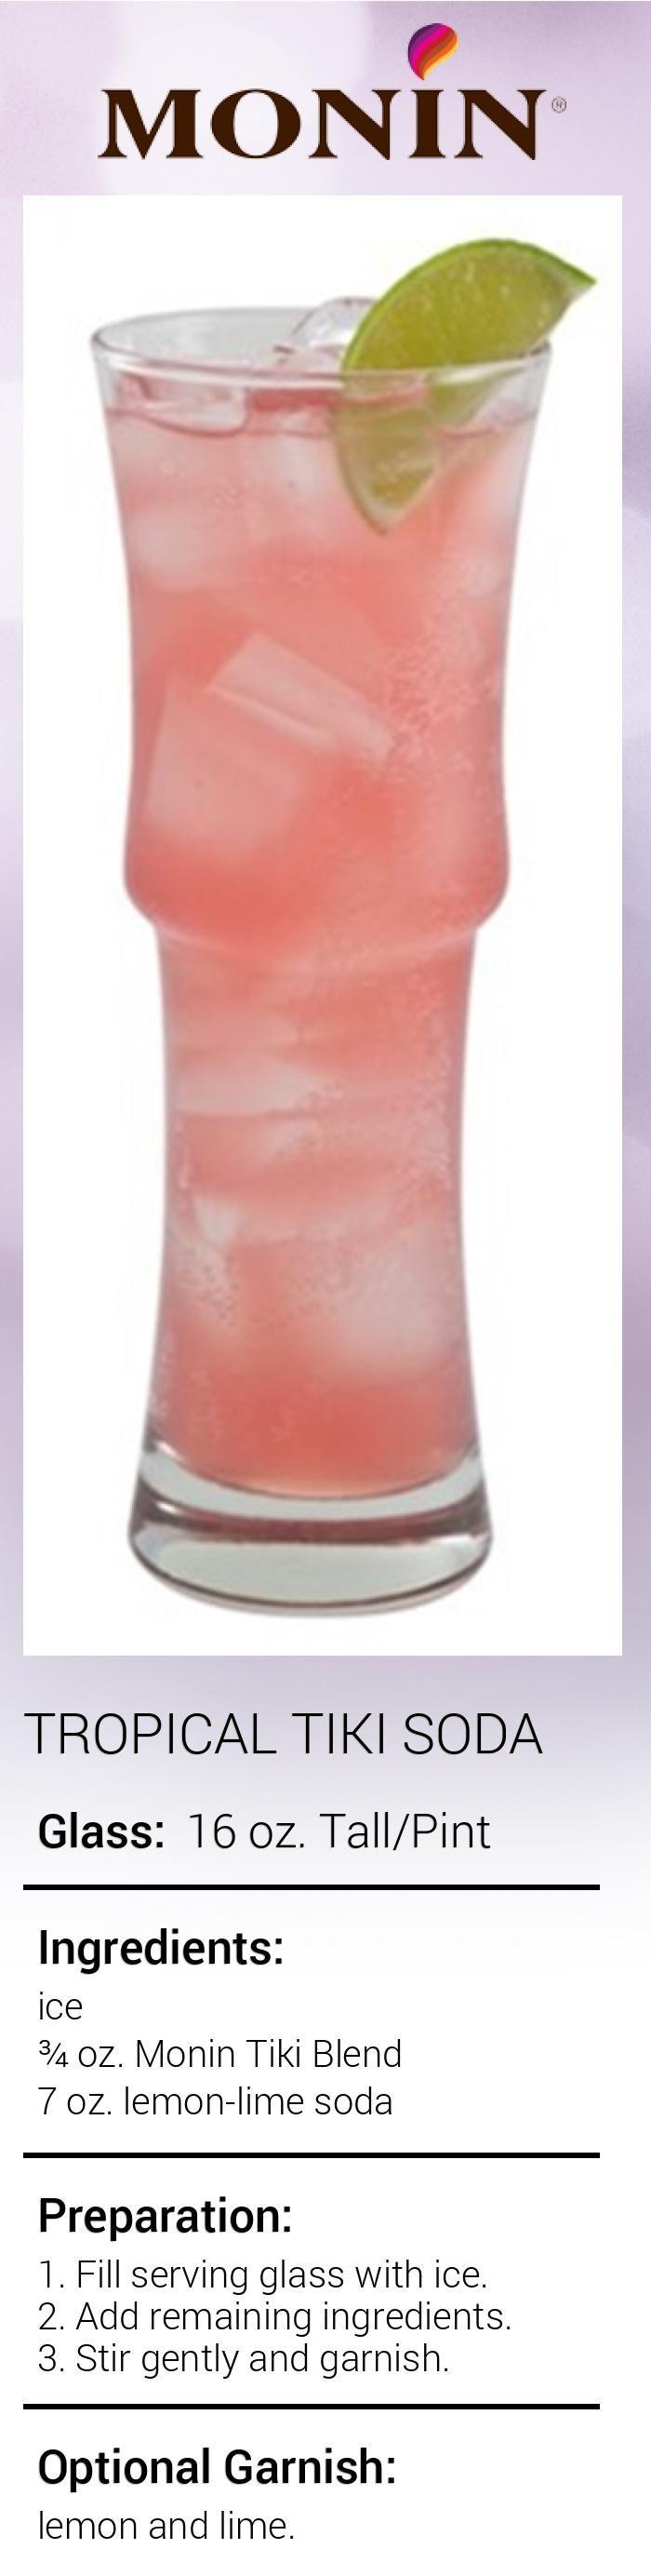 Tropical Tiki Soda